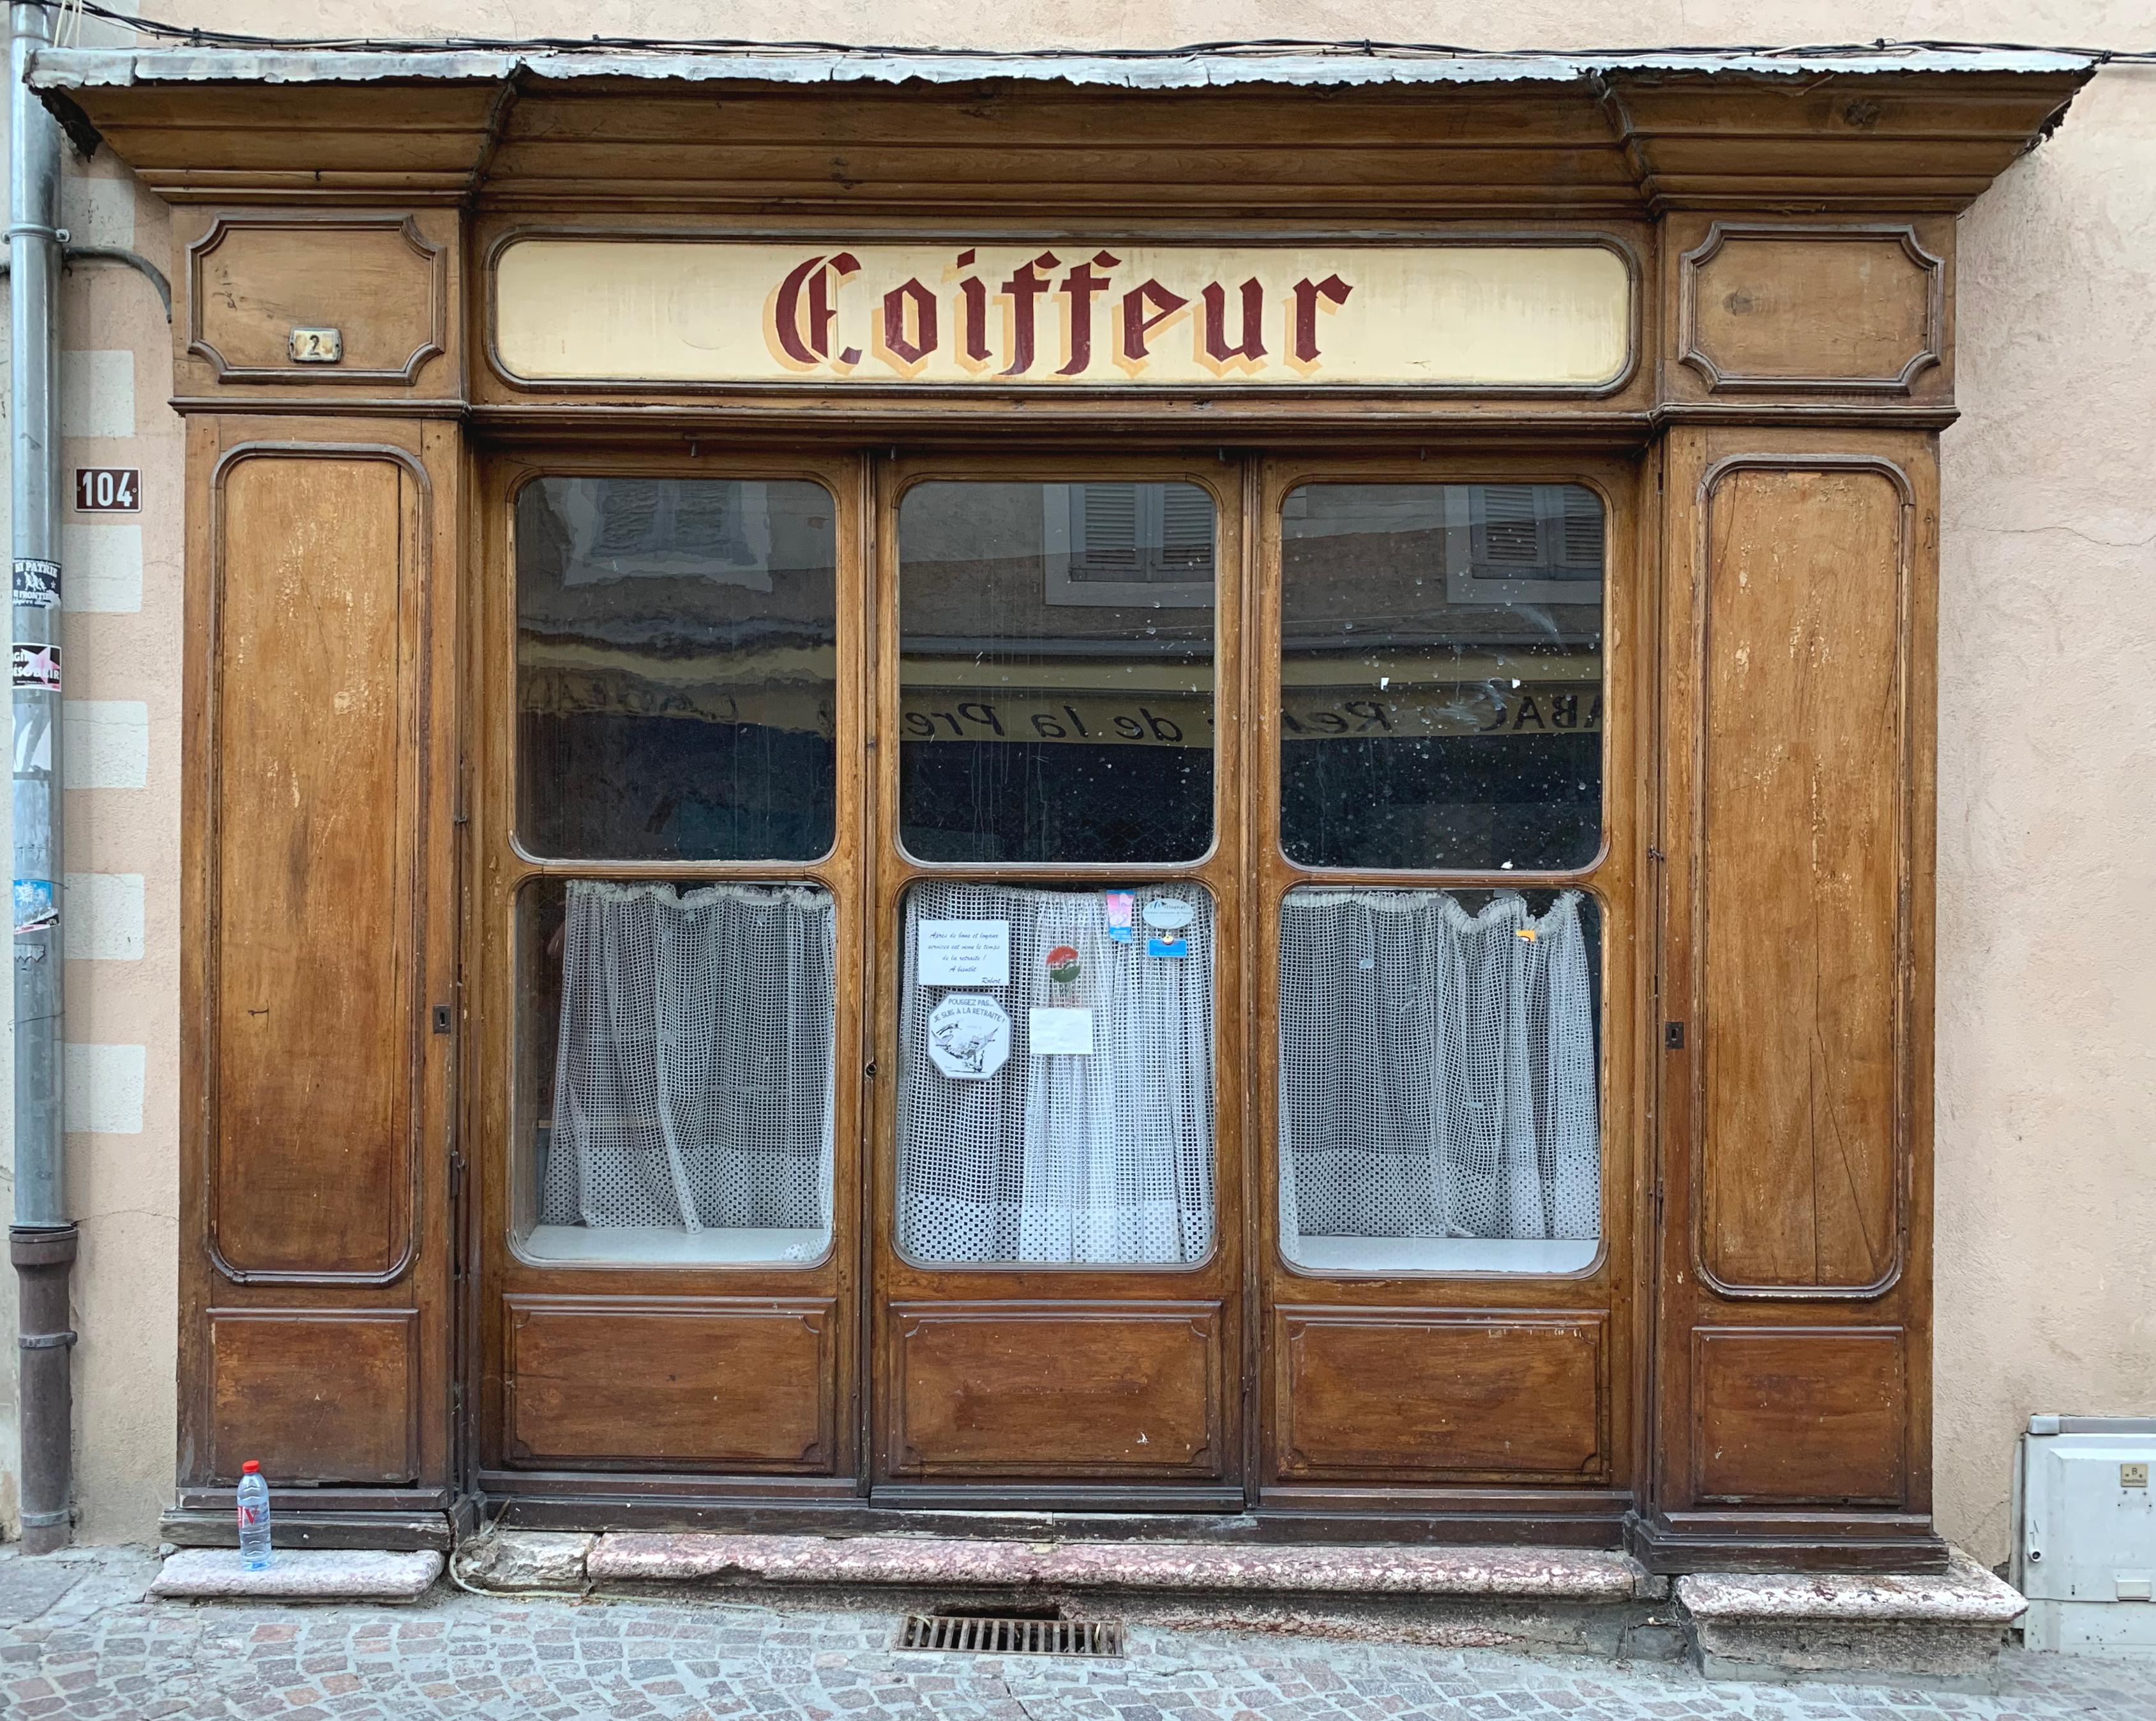 File:Ancien salon de coiffure, rue de la Liberté (Embrun) en ...